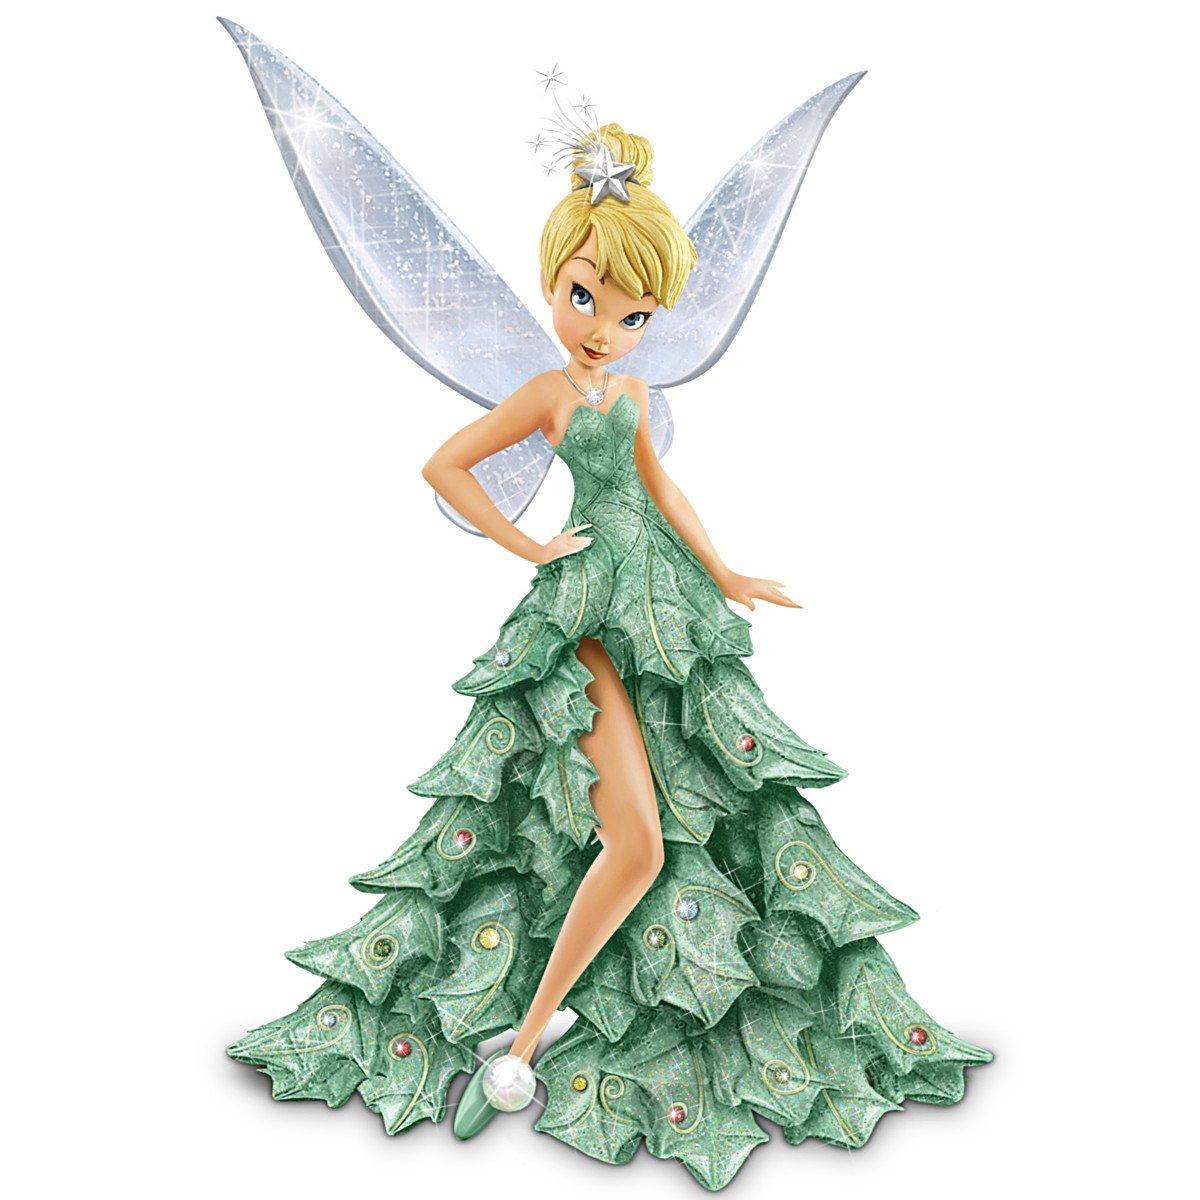 Amazon.com: Bradford Exchange Disney Tinker Bell Christmas Figurine ...